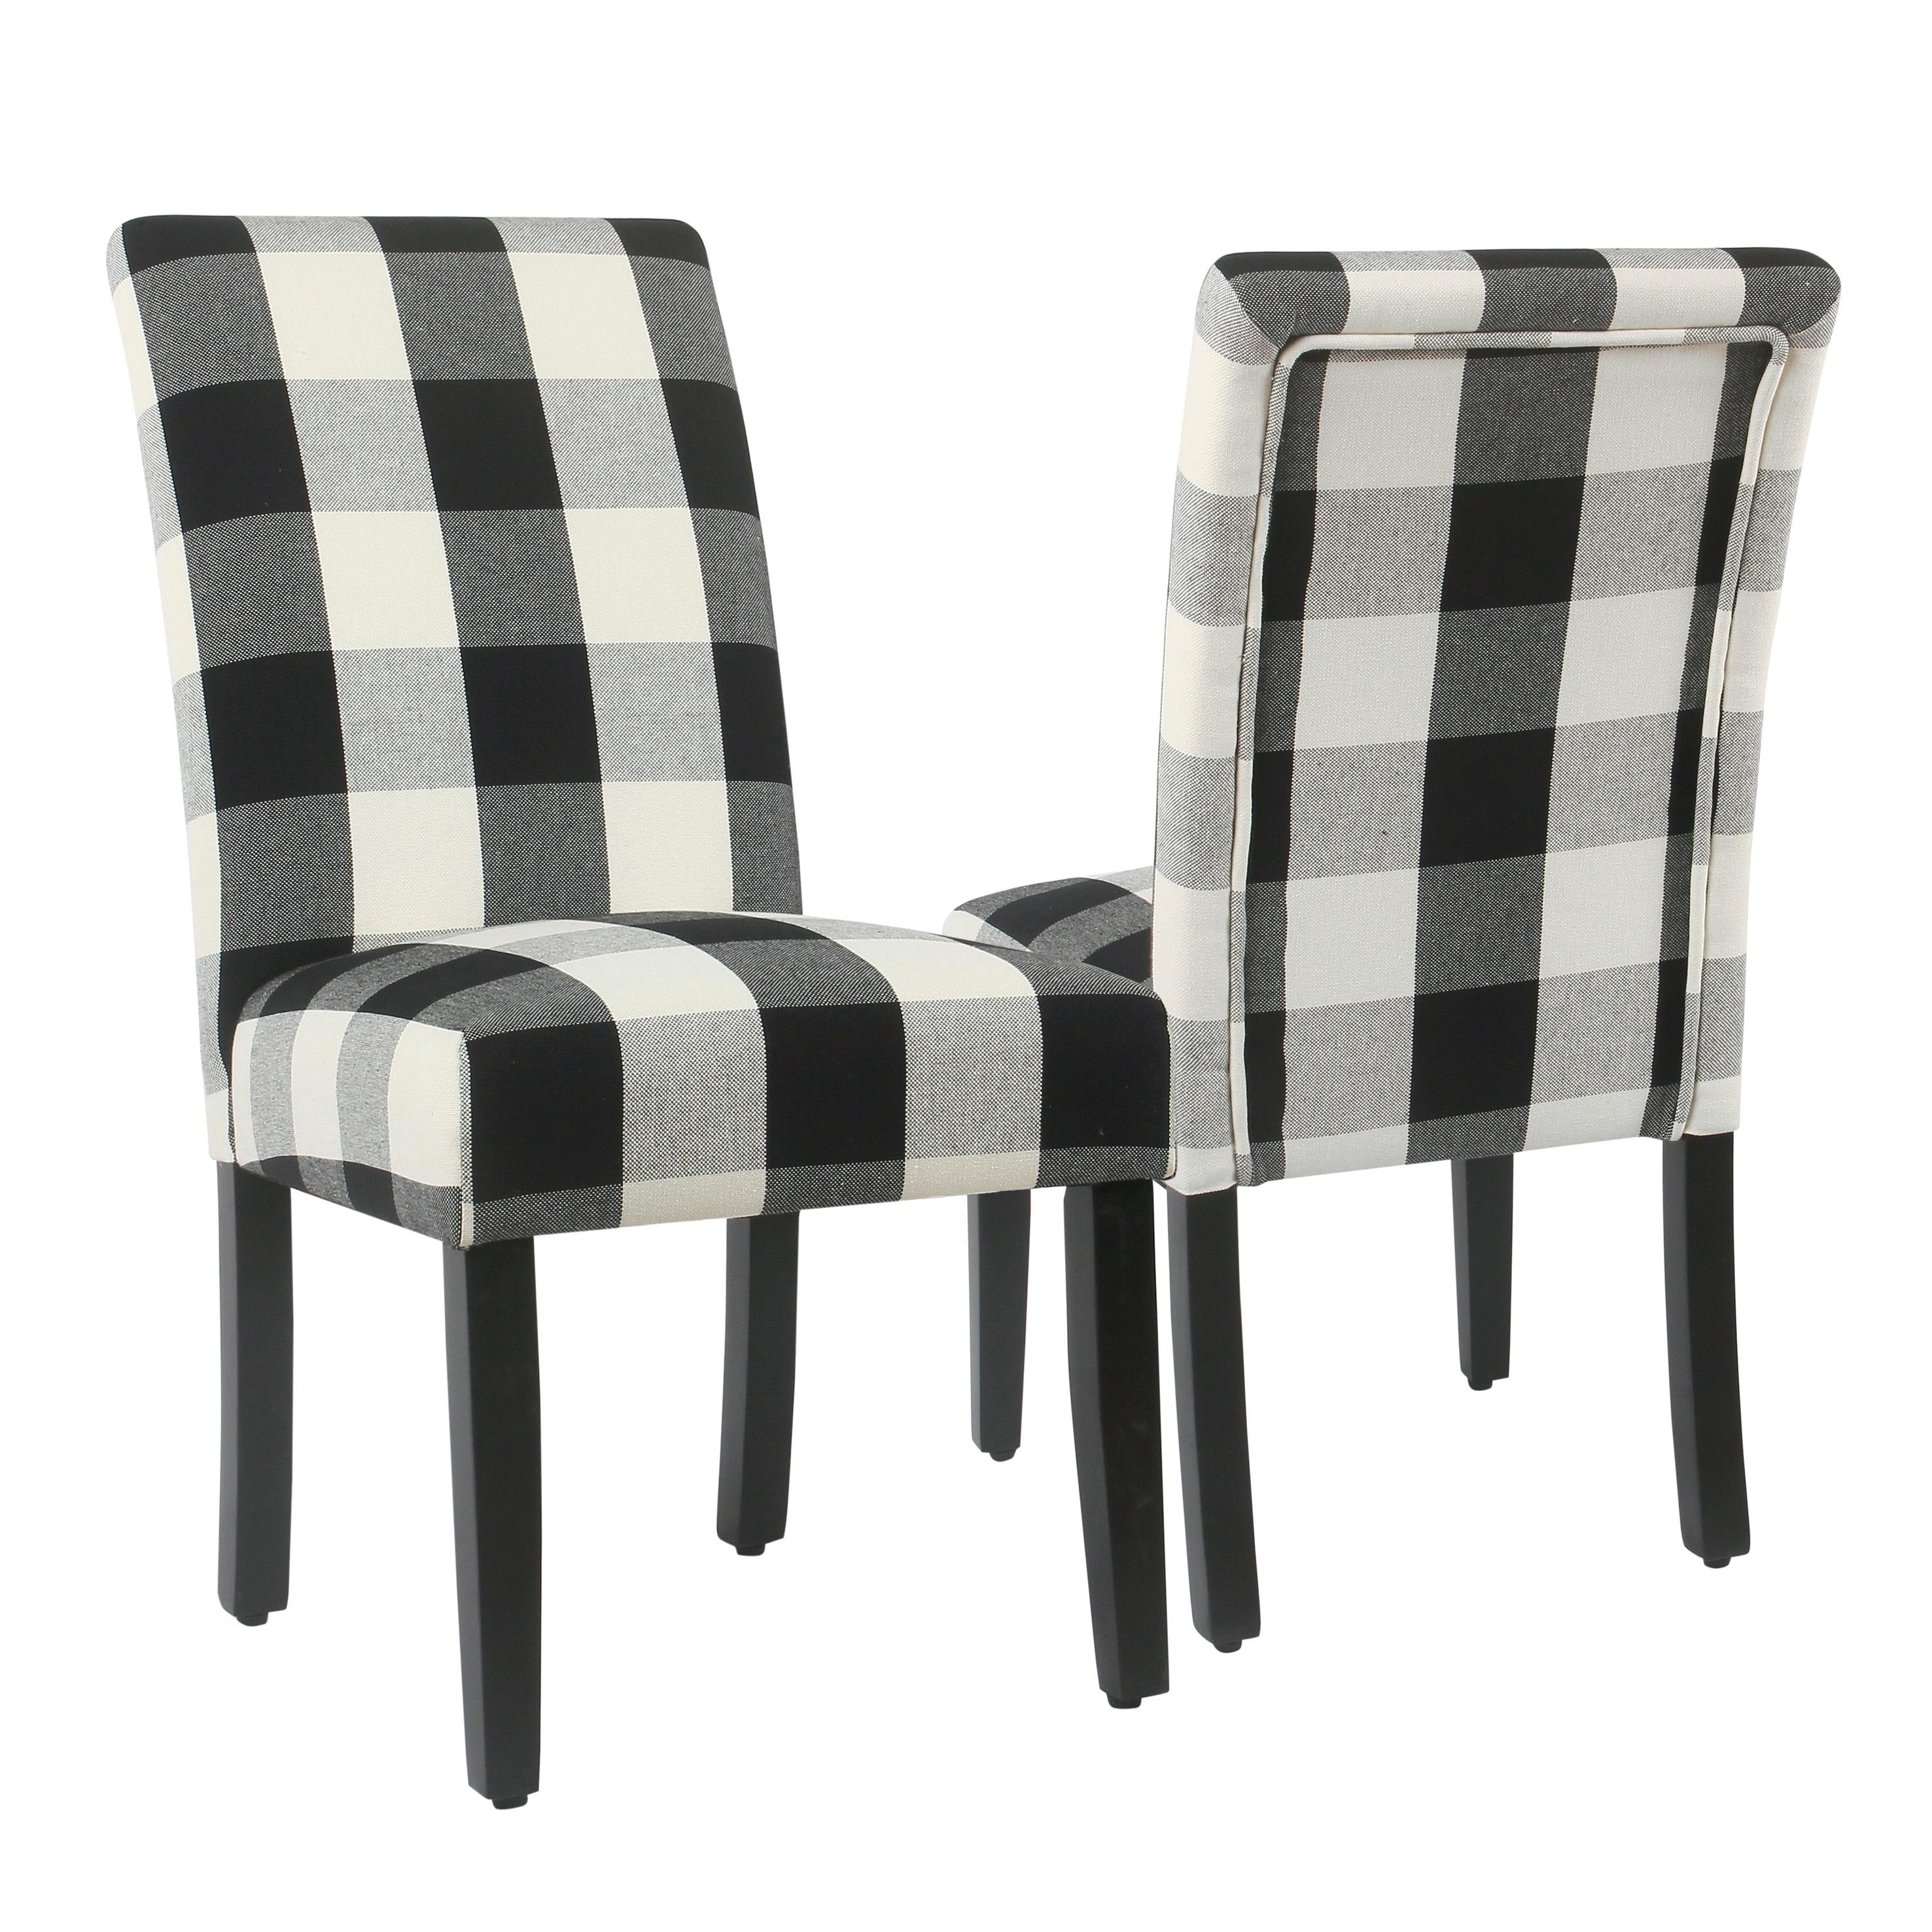 Homepop Parsons Dining Chair Black Plaid Set Of 2